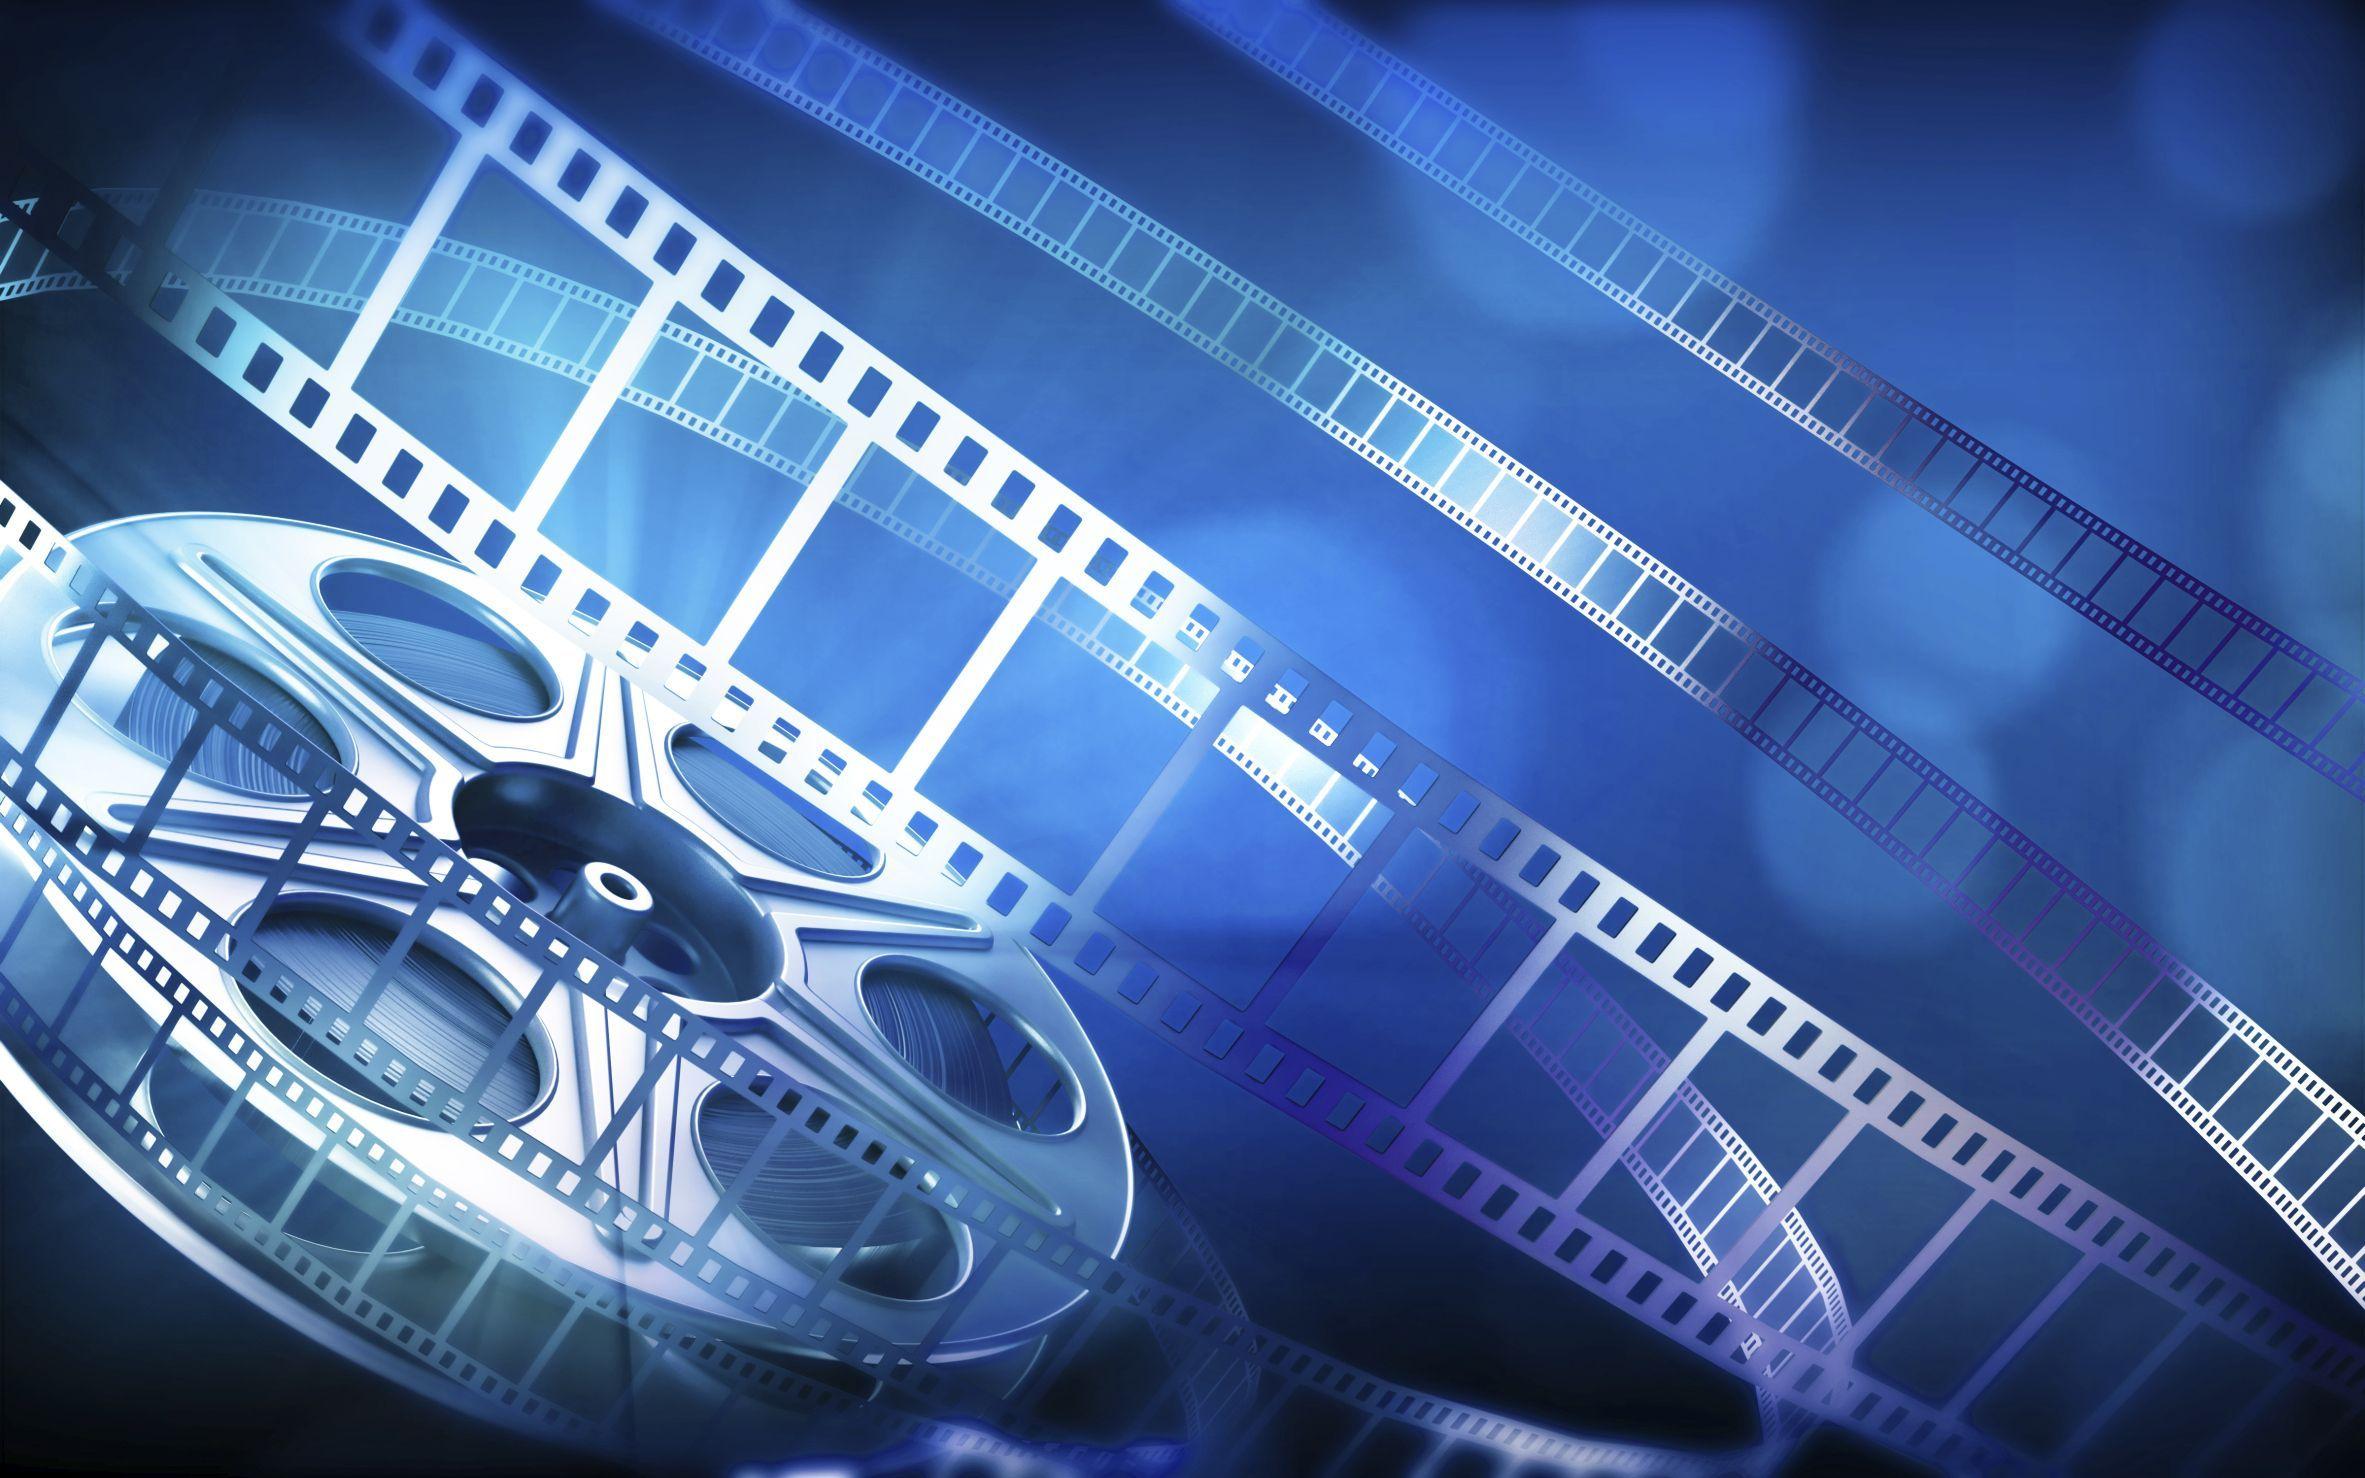 Image For Movie Reel Projector Desktop Wallpaper Film Reel